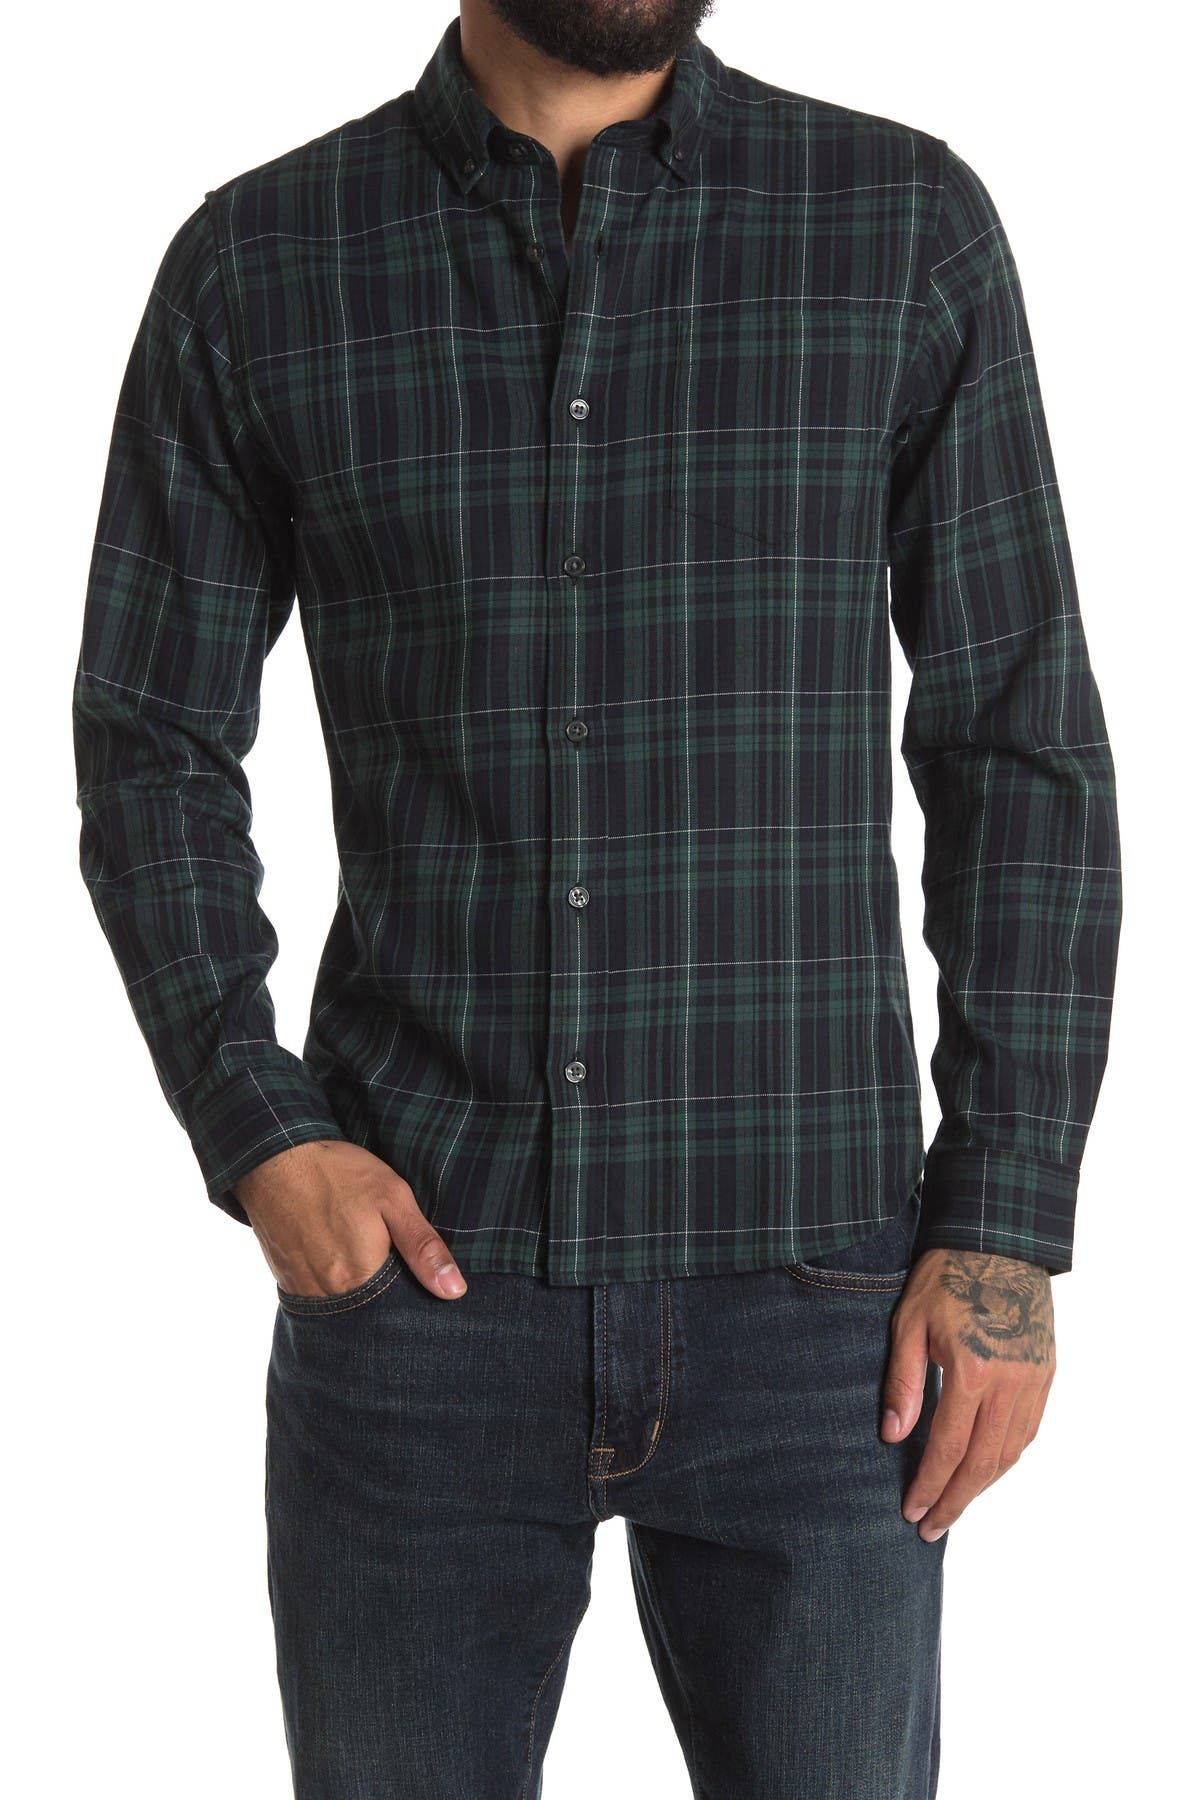 Image of Slate & Stone Long Sleeve Flannel